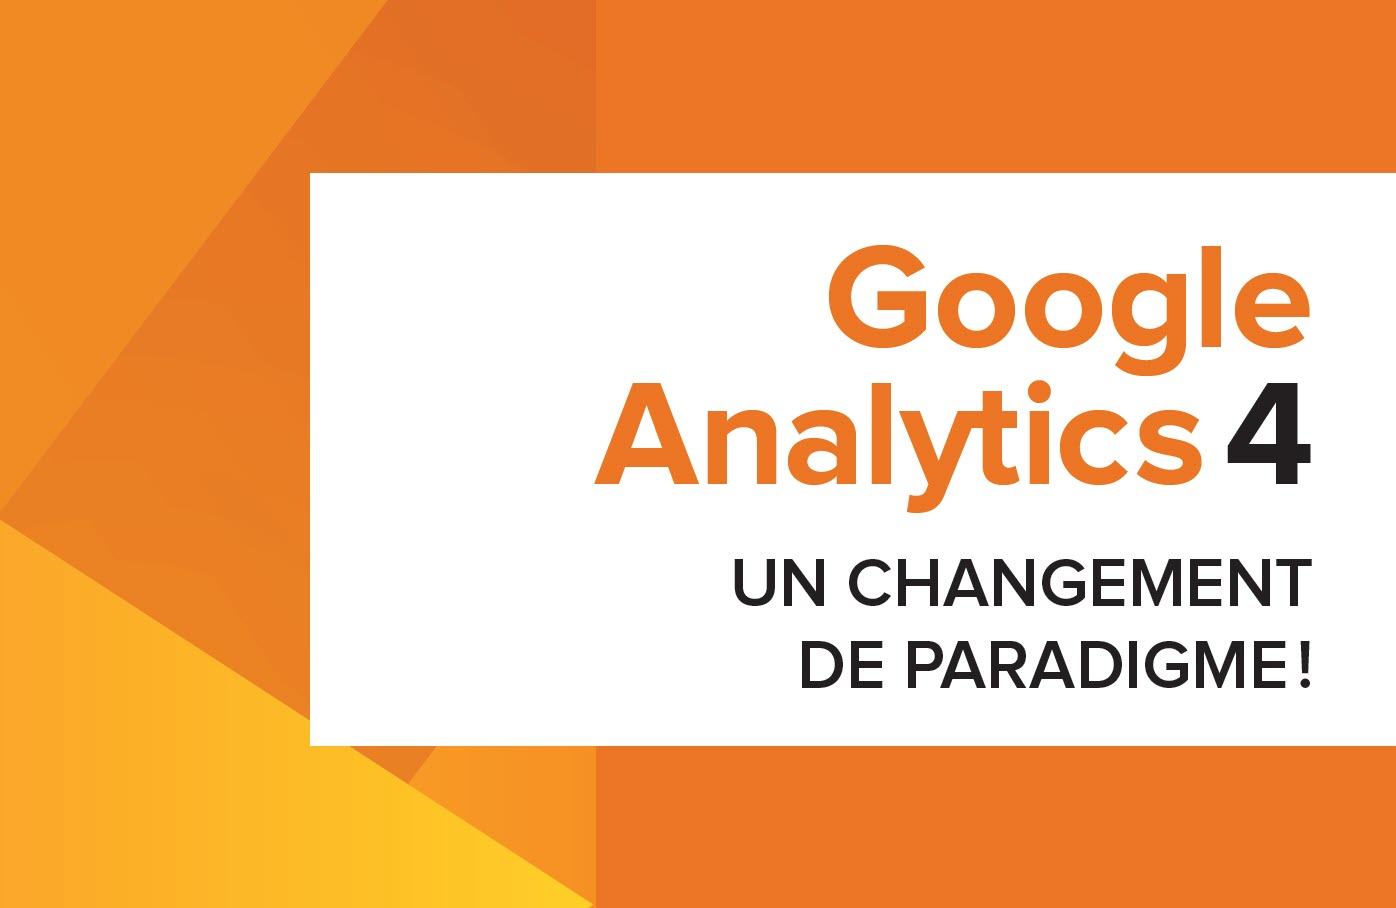 Knewledge vous accompagne avec Google Analytics